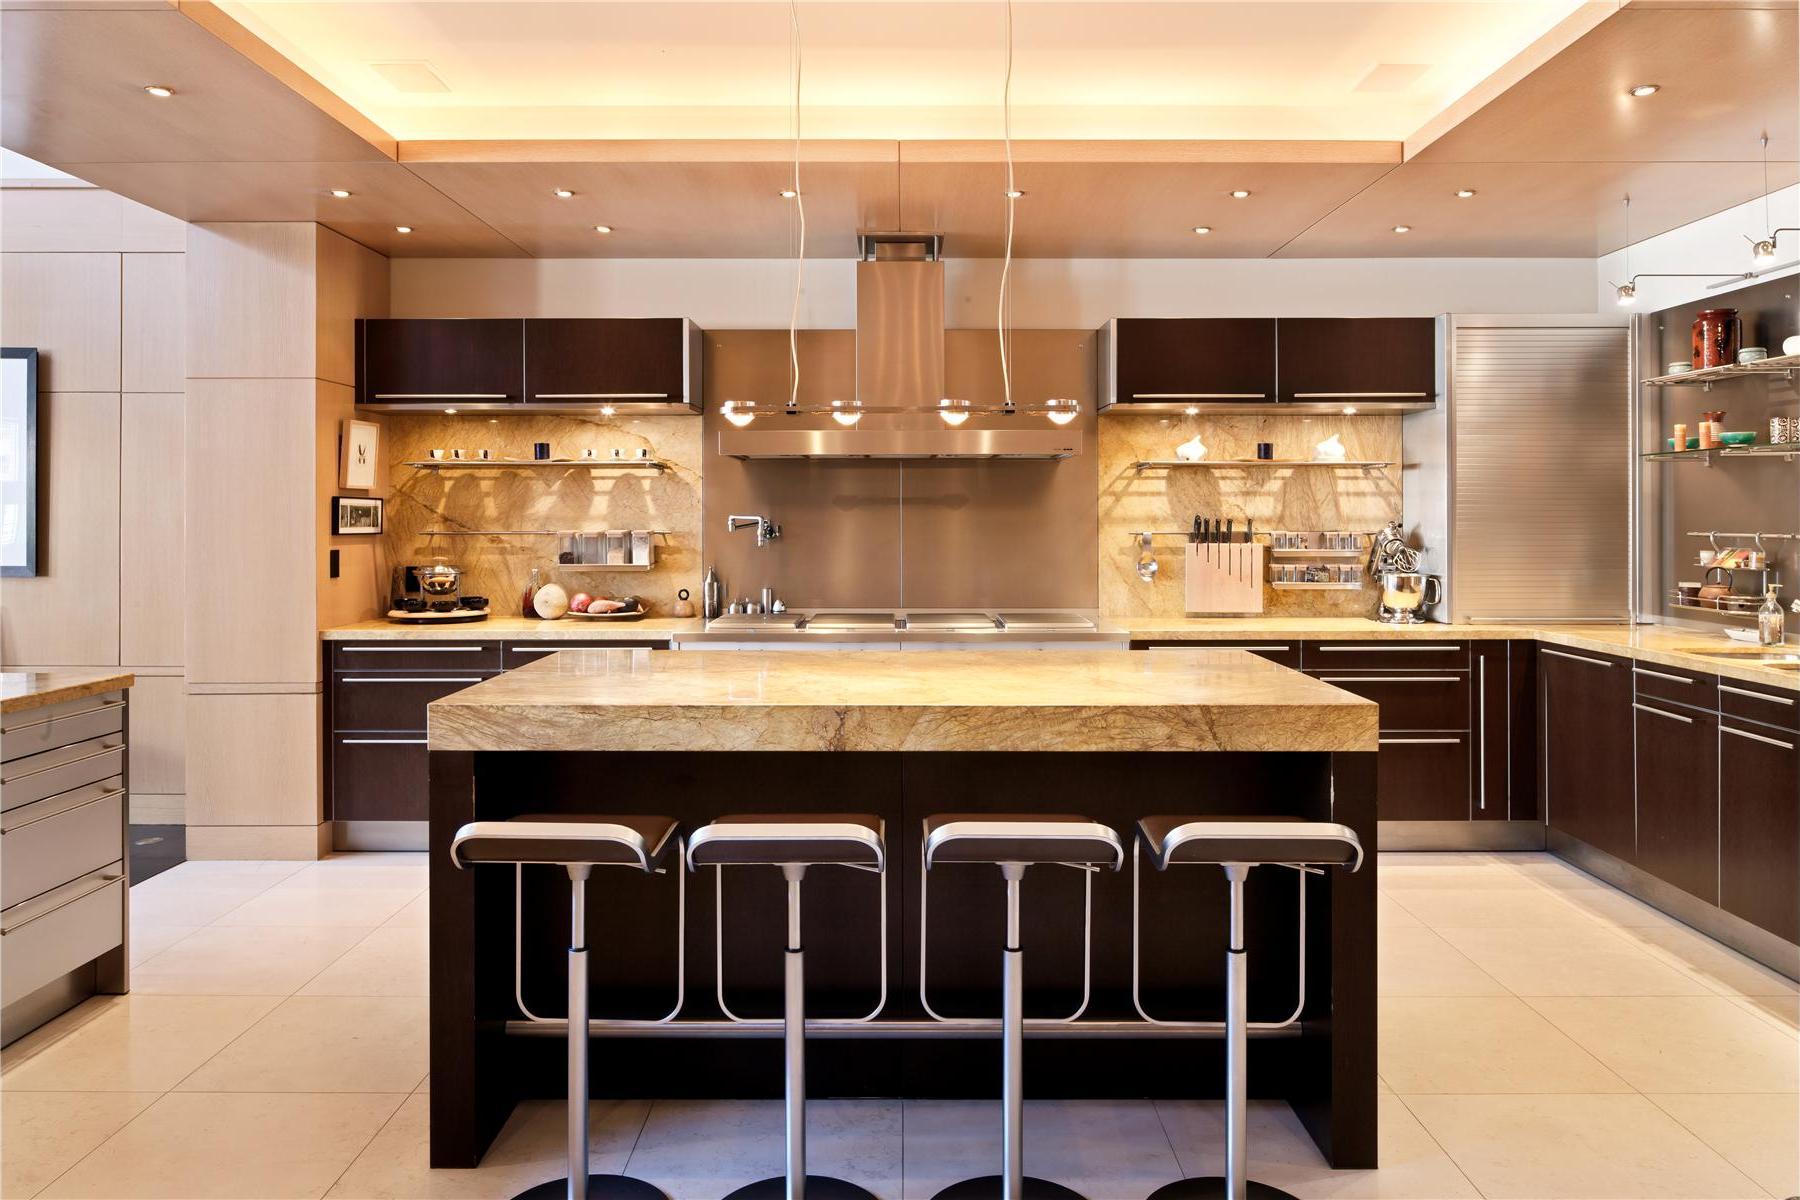 19 Fascinating Dream Kitchen Designs For Every Taste on Small:_Tken7Avcza= Kitchen Renovation Ideas  id=14061